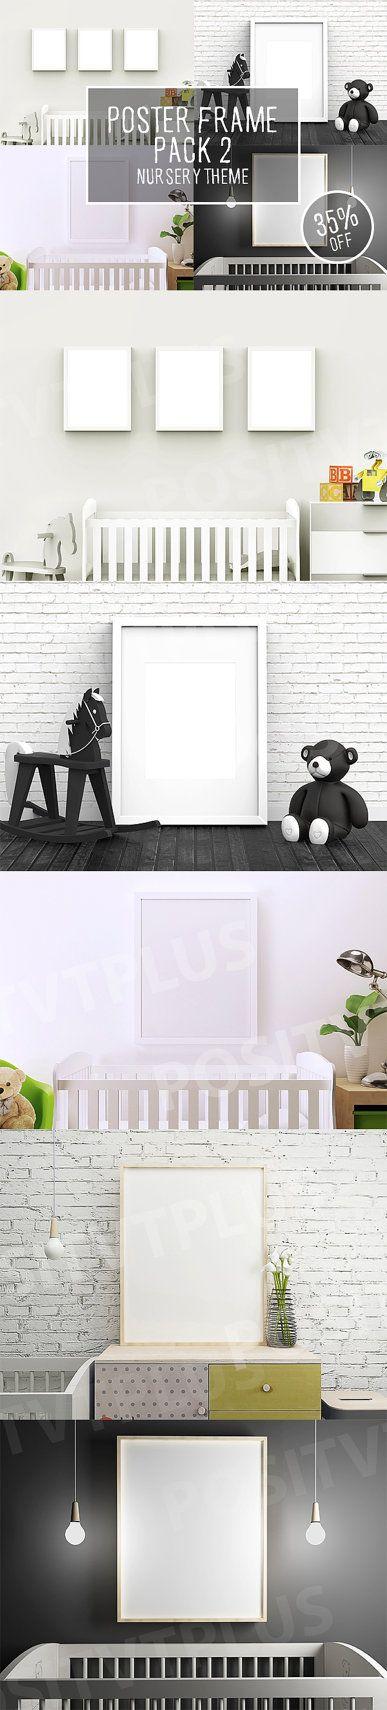 Poster Frame Pack 2  Nursery Theme / frame mockup / by Positvtplus